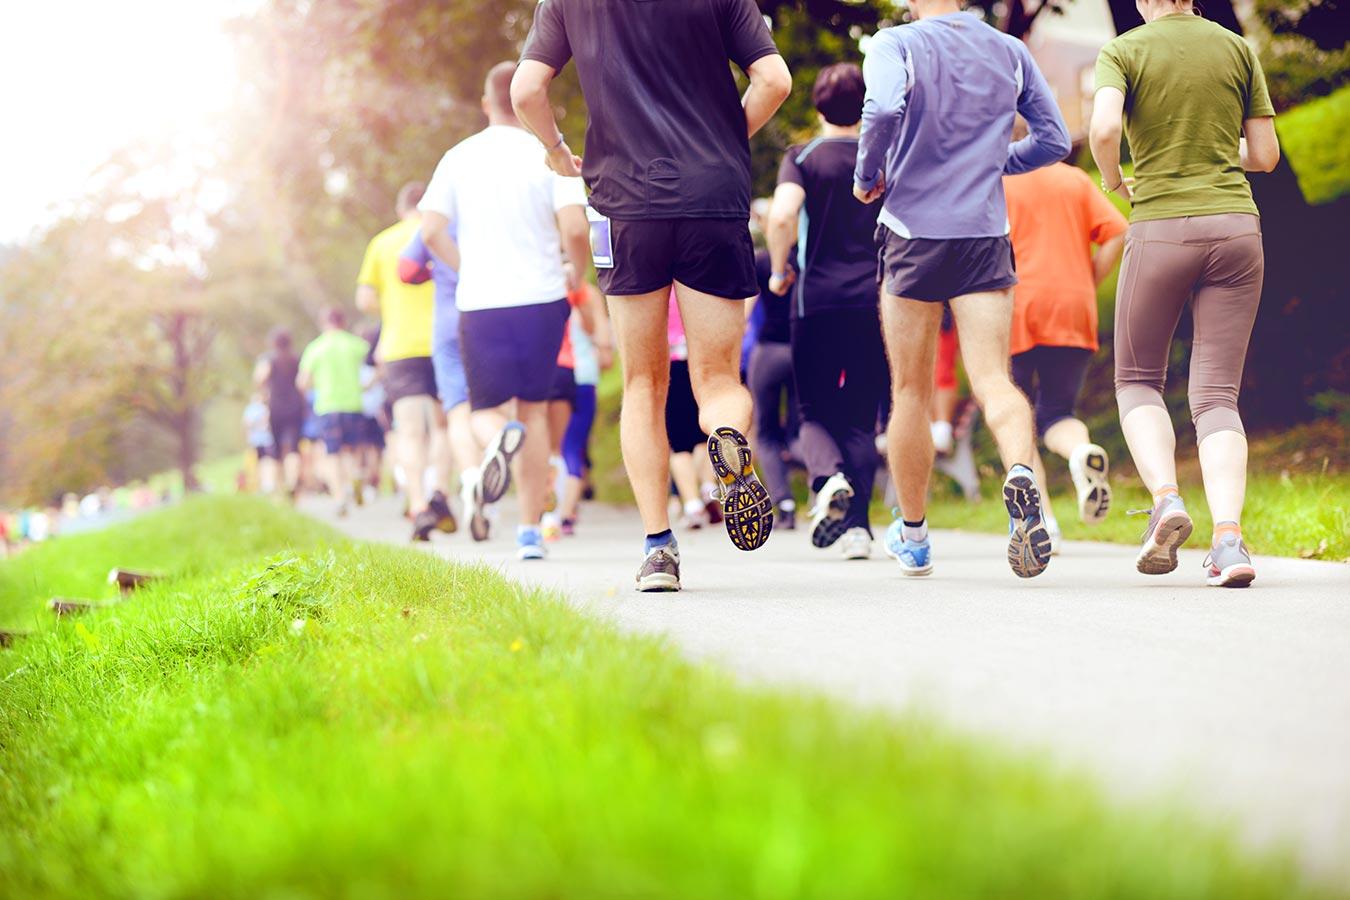 moze-li-previse-trcanja-biti-stetno-za-zdravlje